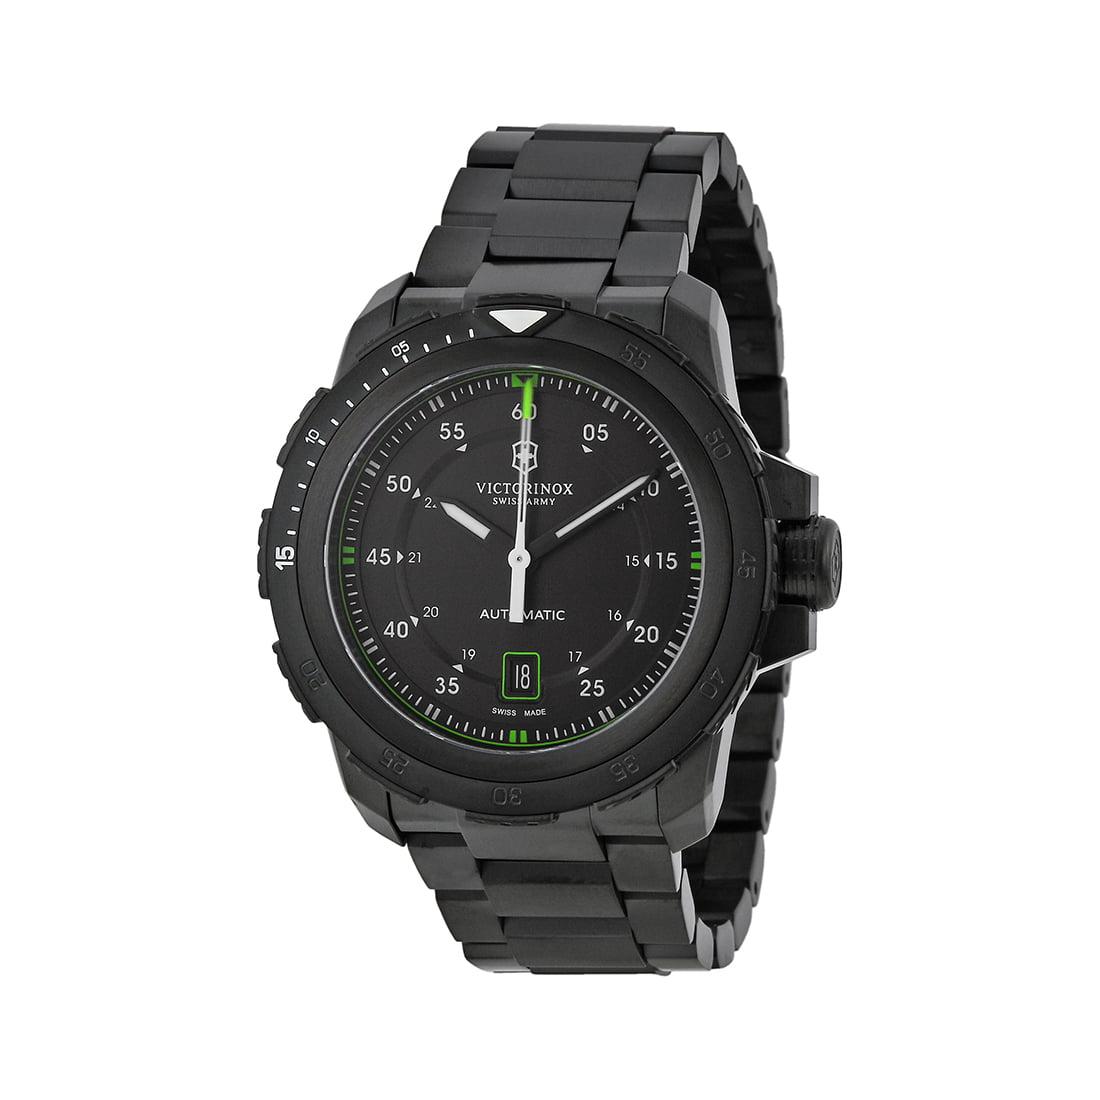 Swiss Army Men's Watch Alpnach Mechanical Black Dial Ion-Plated Watch 241684 by Victorinox